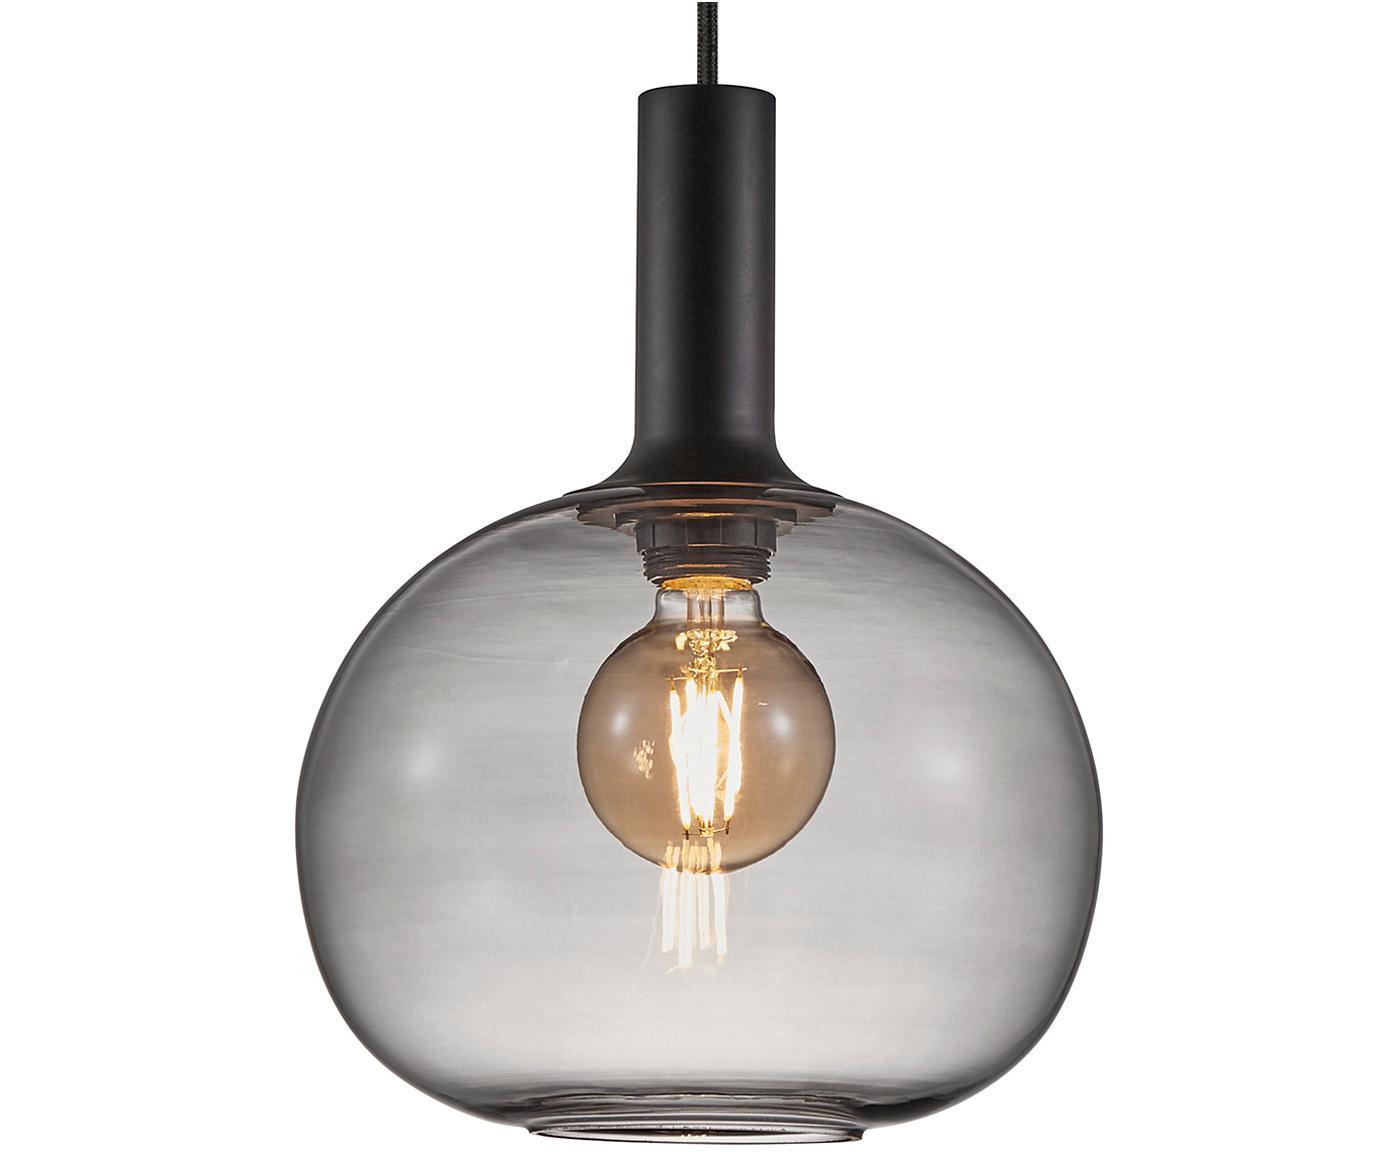 Lampada a sospensione Alton, Paralume: vetro, Nero, grigio trasparente, Ø 25 x Alt. 33 cm